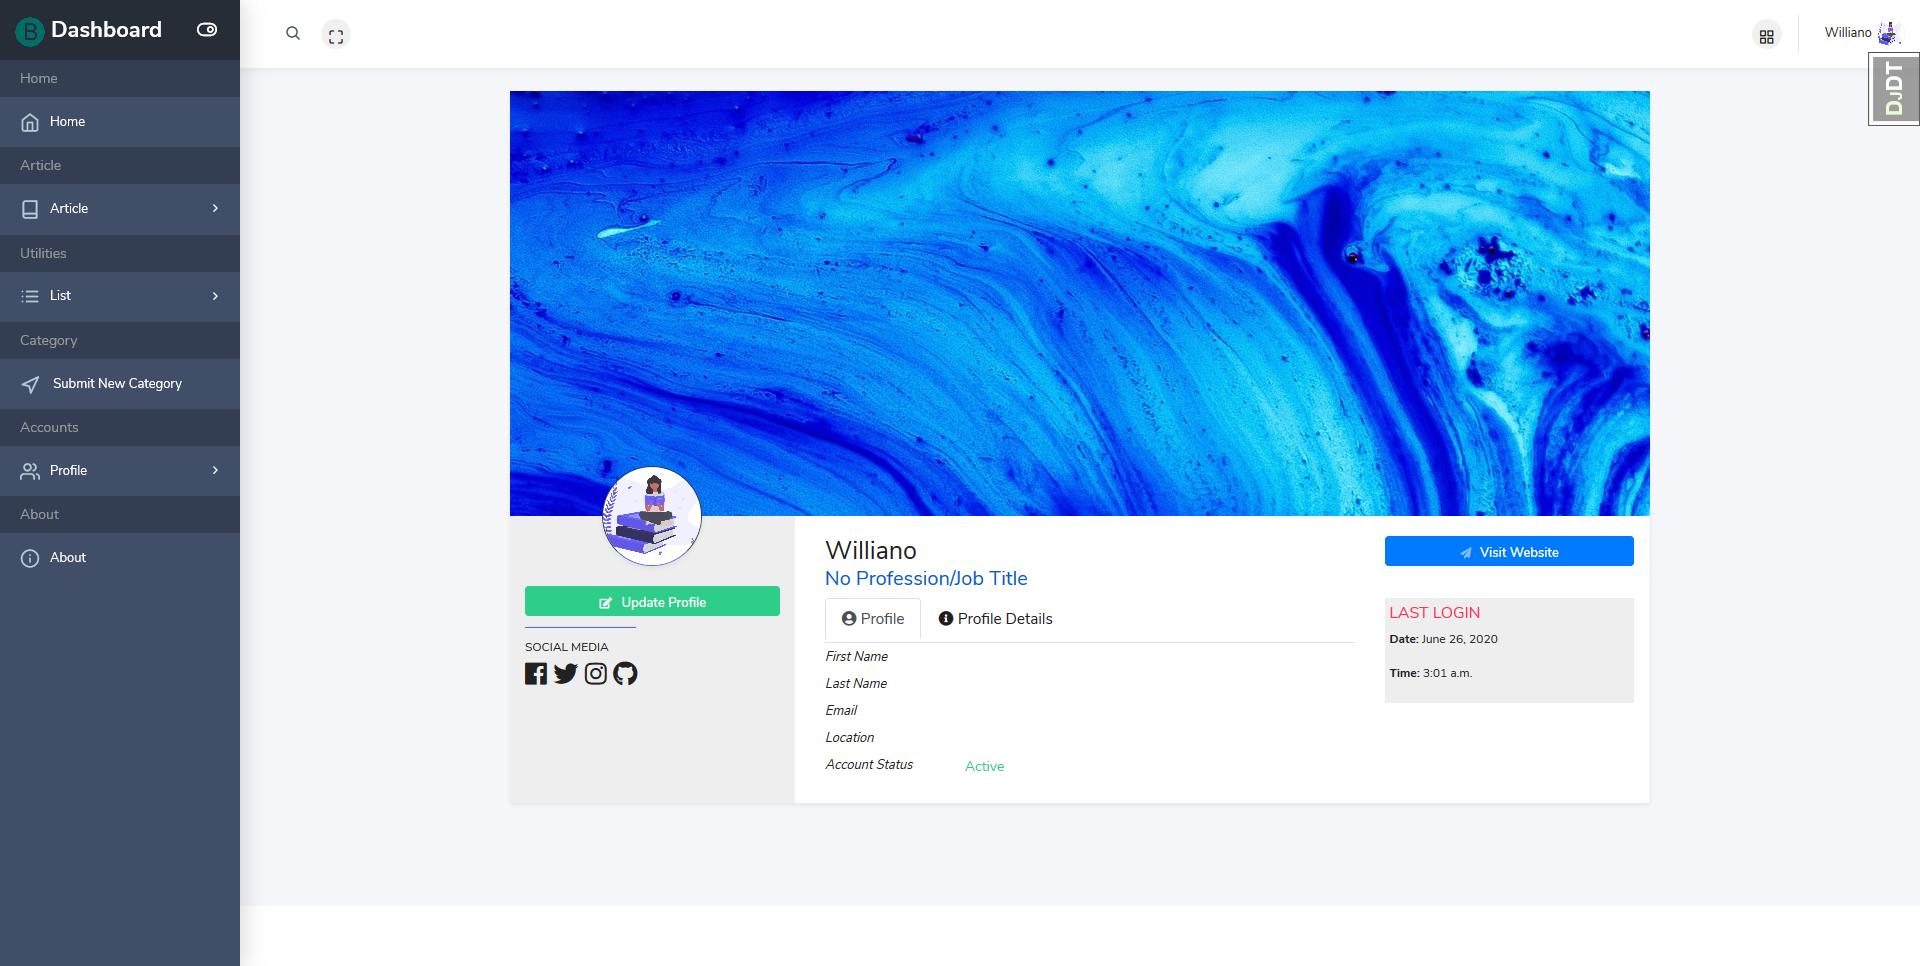 Screenshot_2020-06-25 Bona Dashboard Profile Details